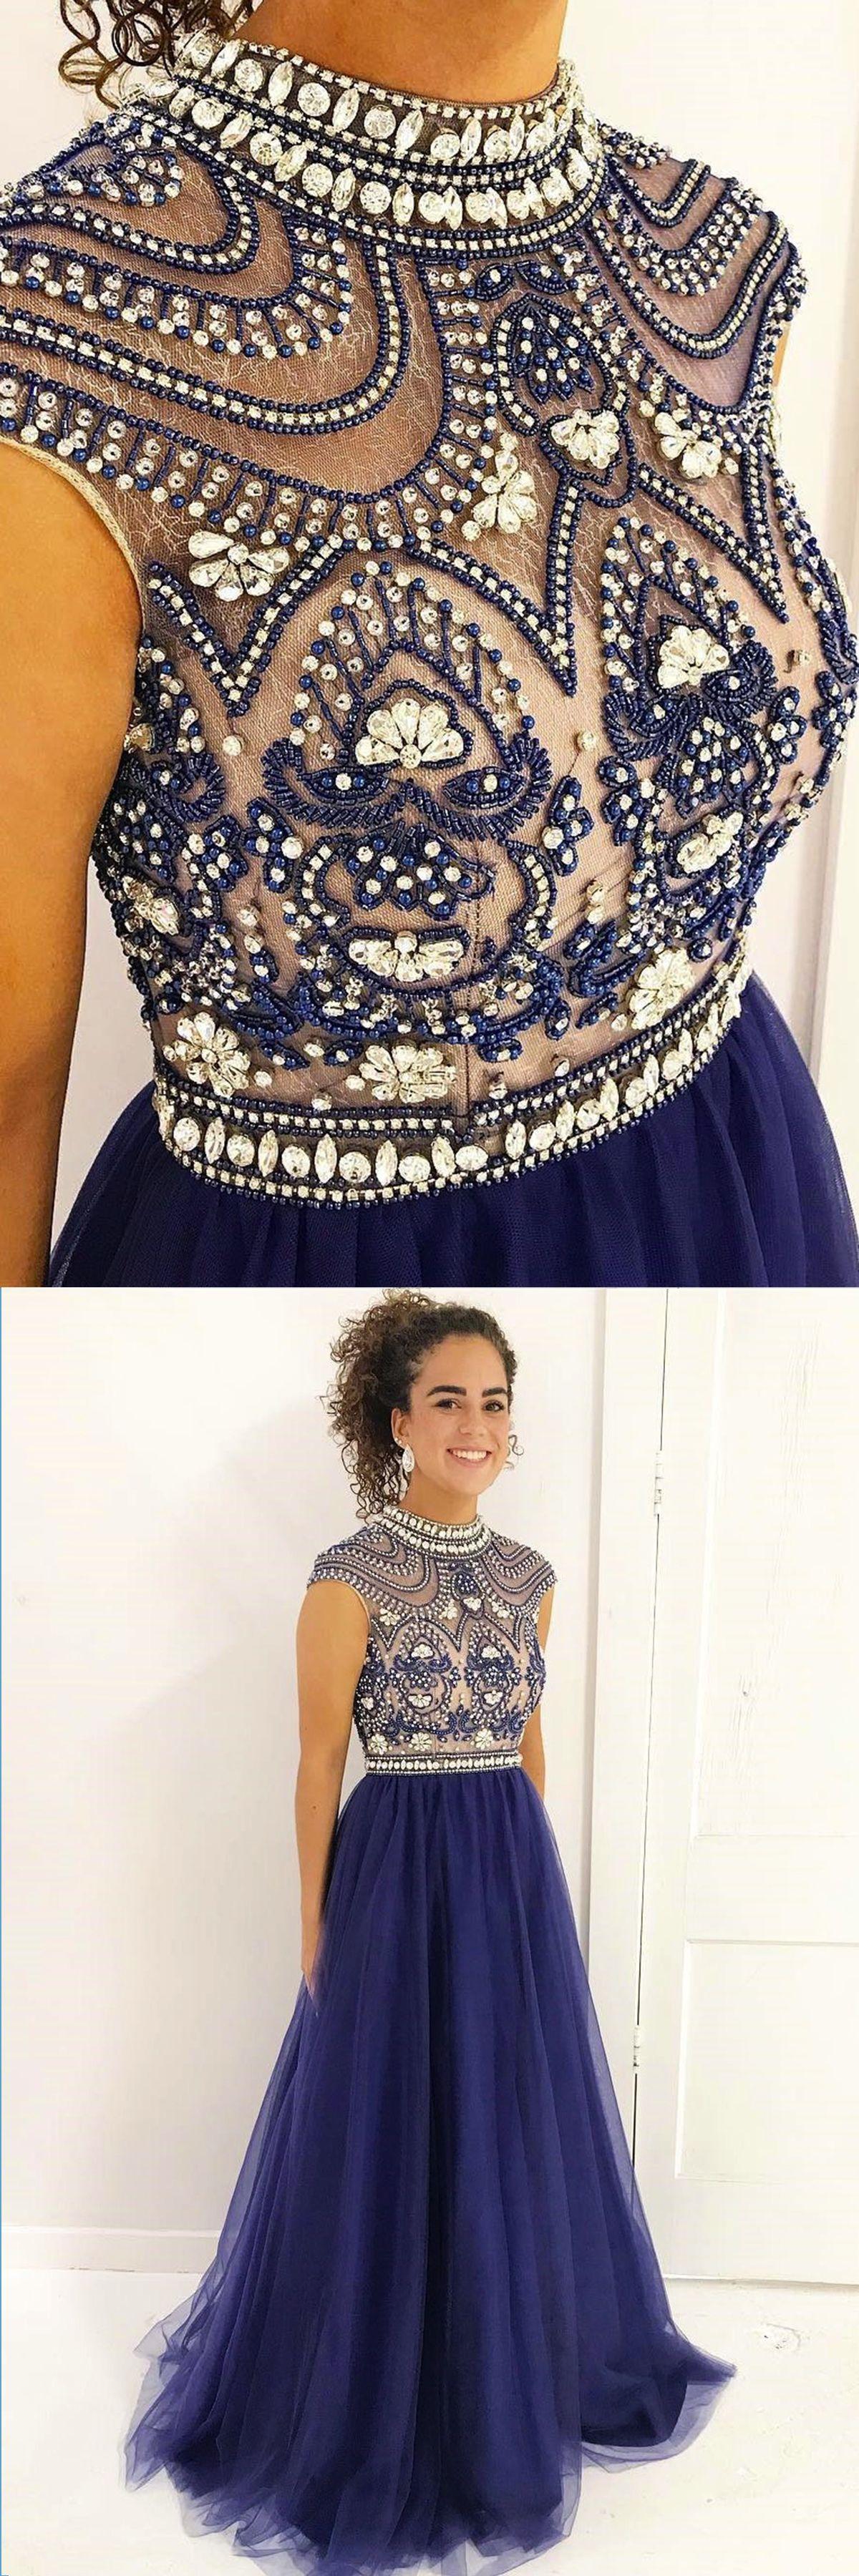 Prom dresses beaded navy blue tulle prom dress for teens